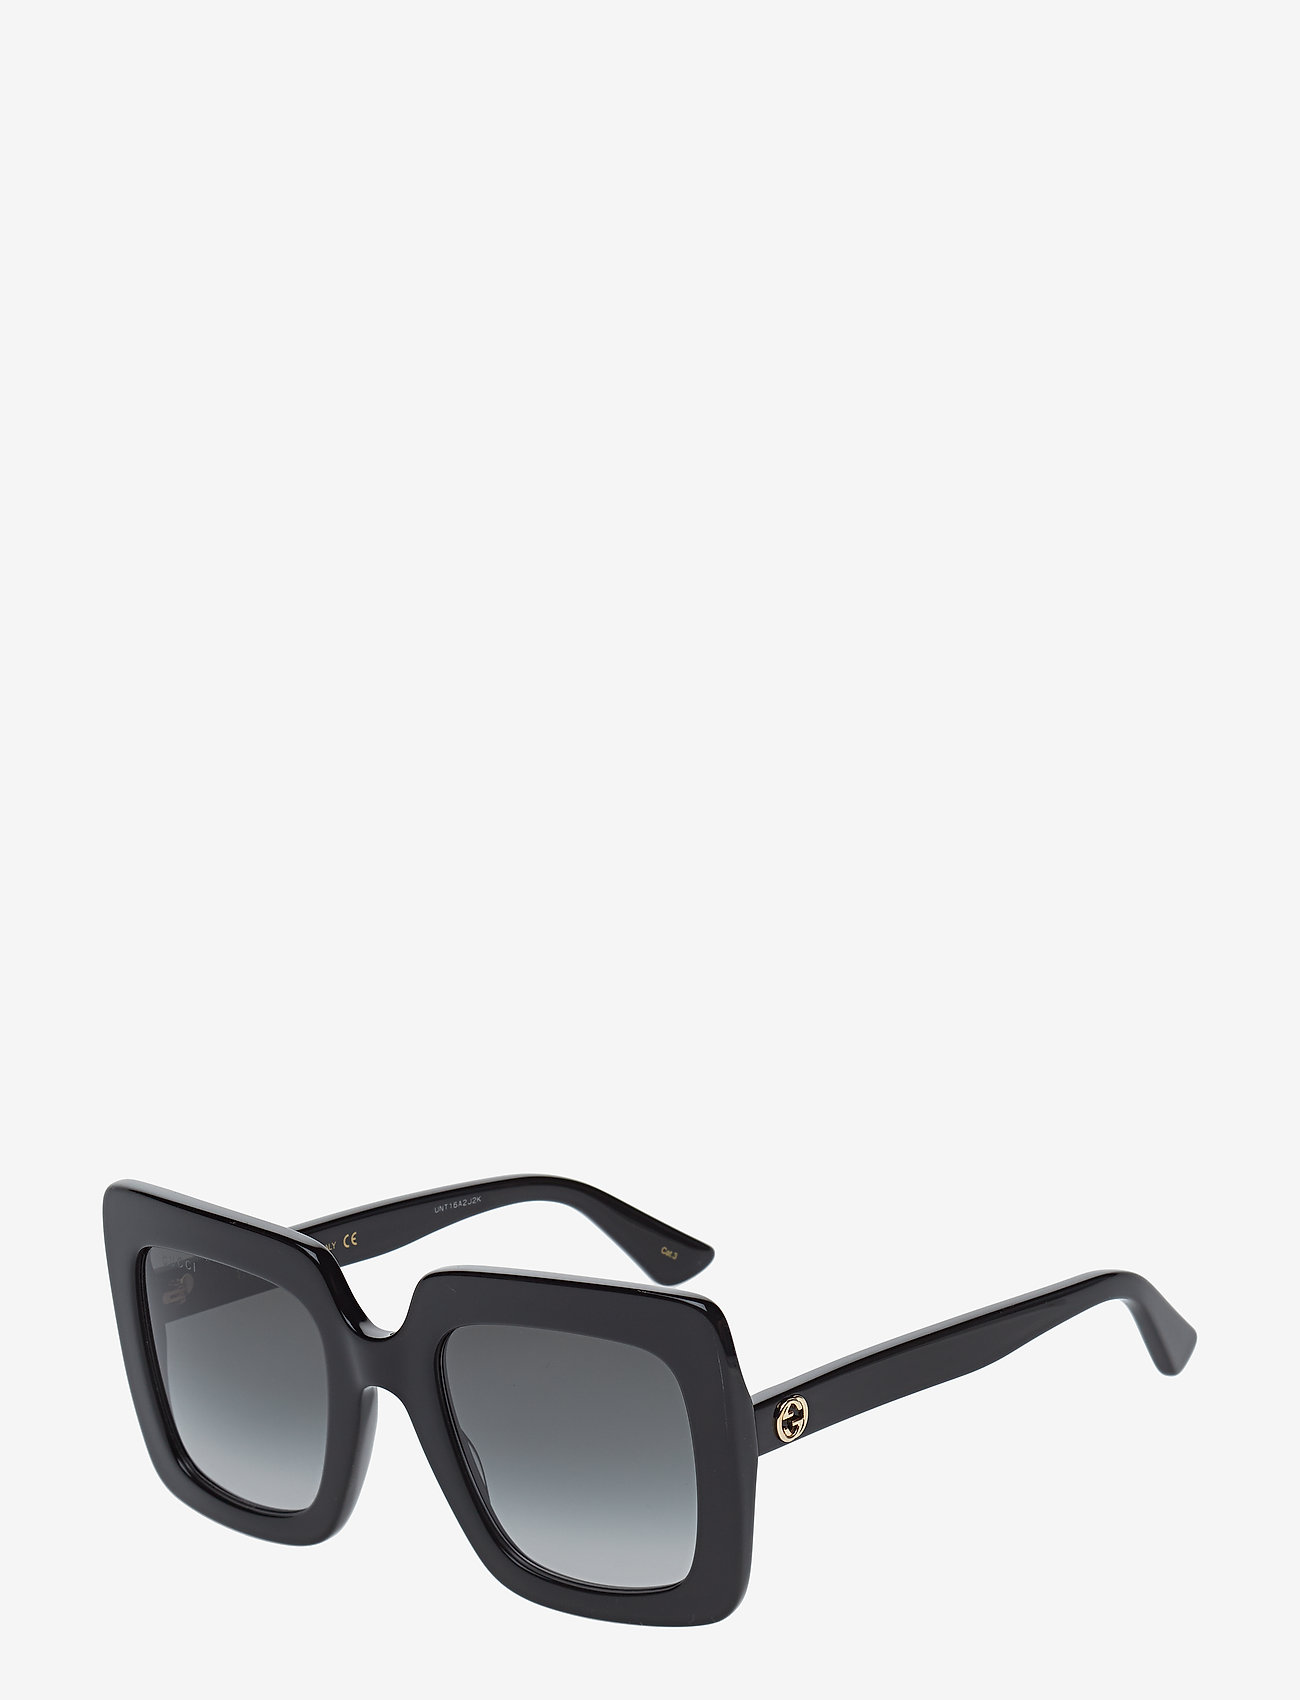 Gucci Sunglasses - GG0328S - neliökehys - black-black-grey